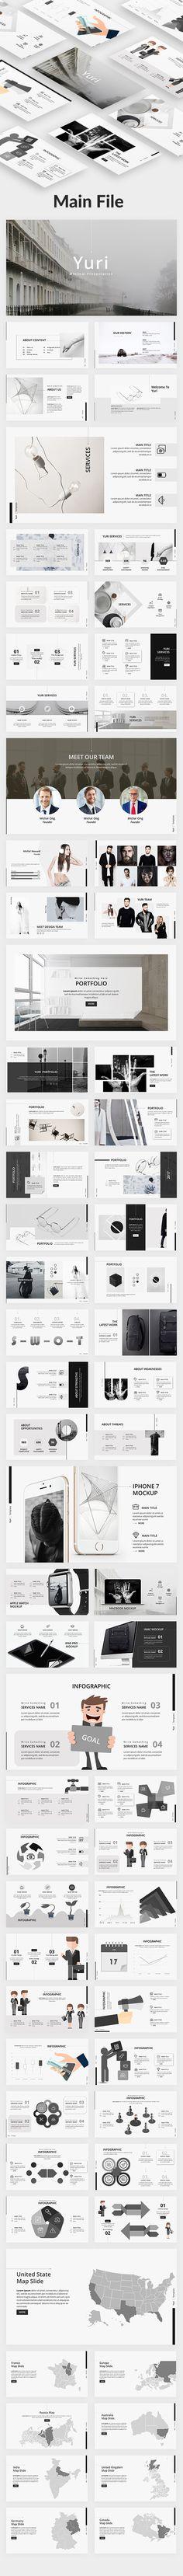 Yuri Creative Keynote Template — Keynote KEY #corporate #business • Download ➝ https://graphicriver.net/item/yuri-creative-keynote-template/20340550?ref=pxcr